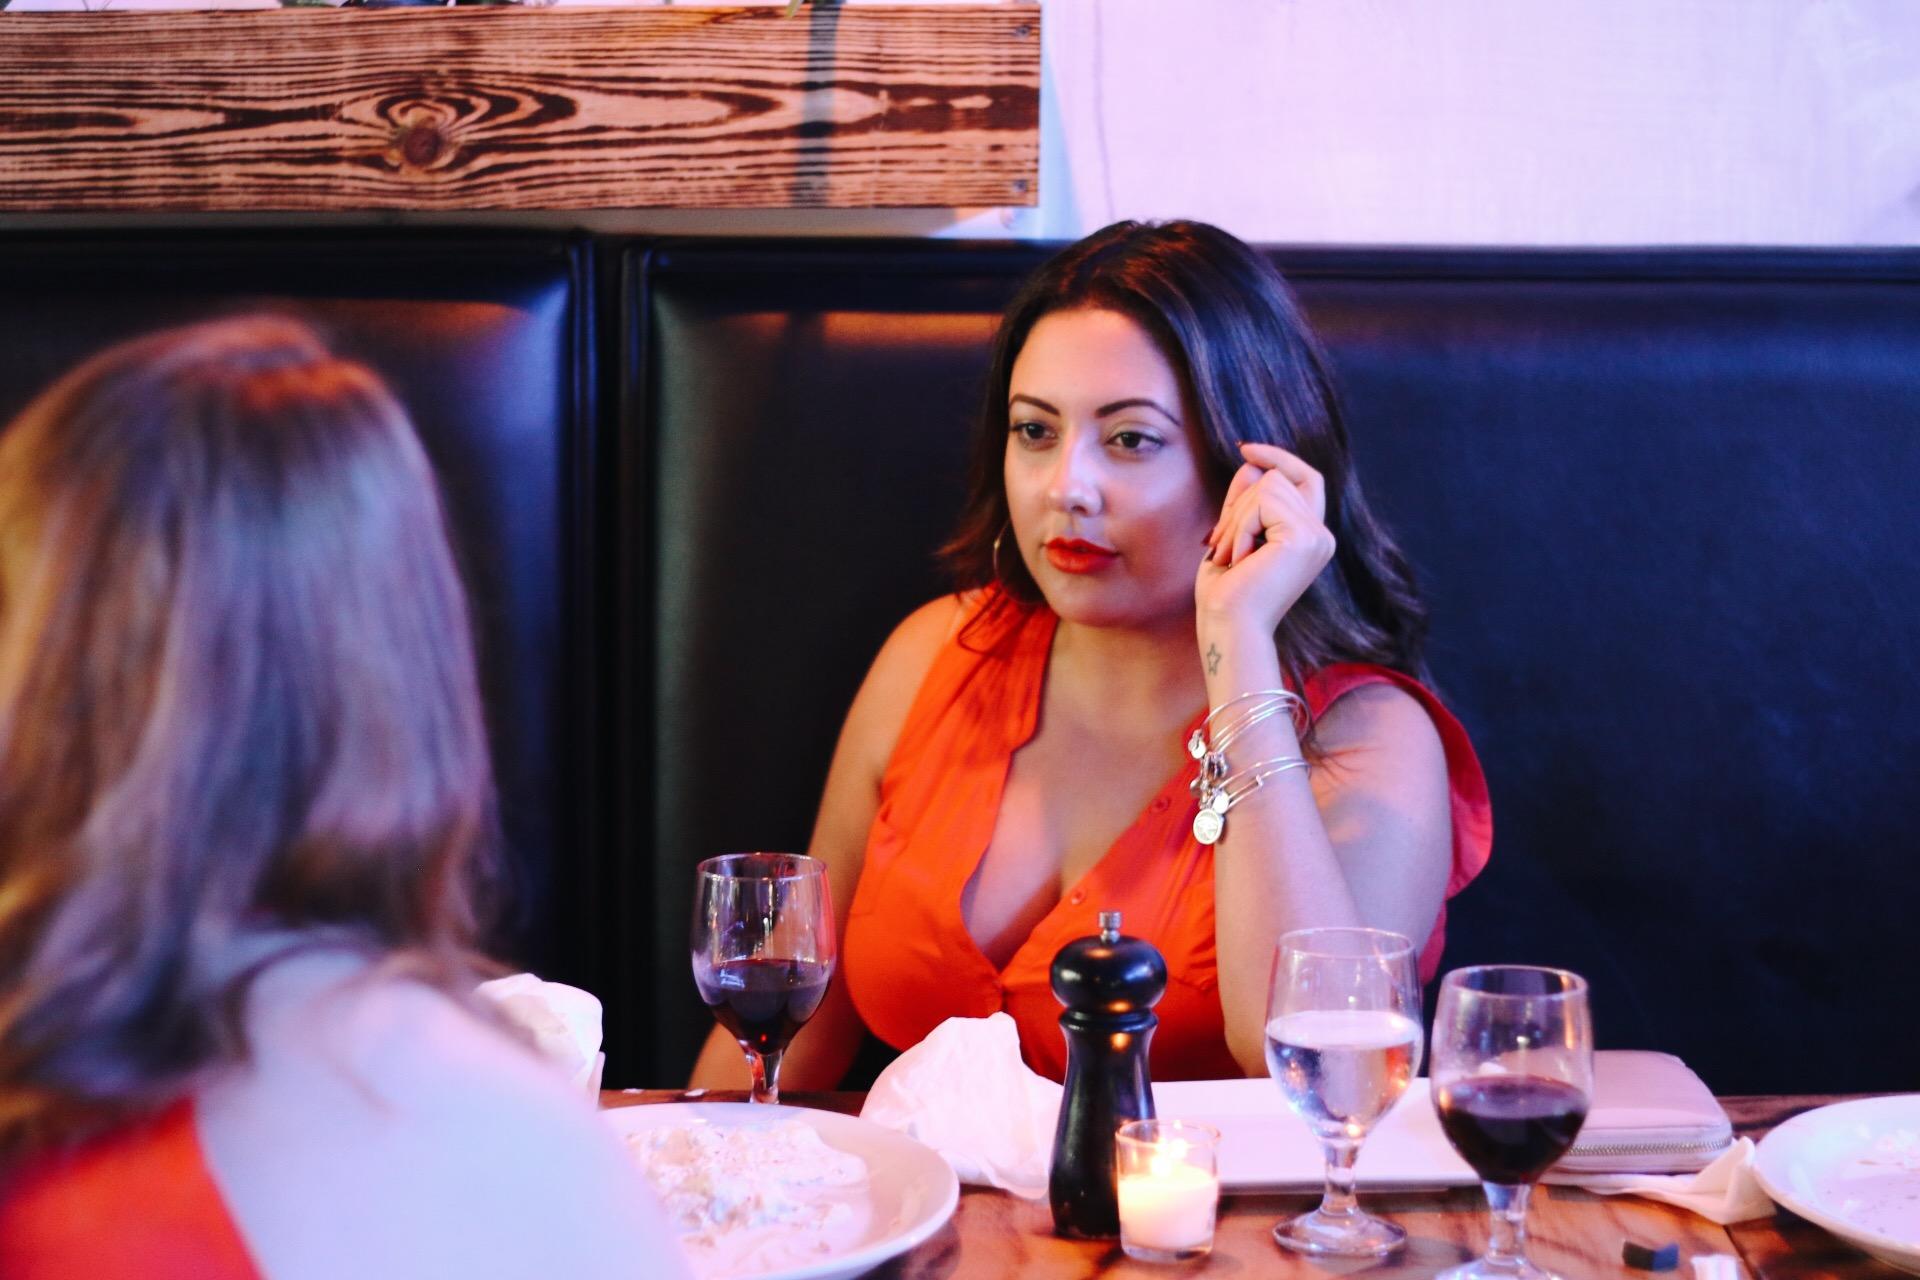 Women Who Wine-Uncorked Conversations-Eat Greek-Miami Wine Events-Wine Tasting Miami-48.jpg